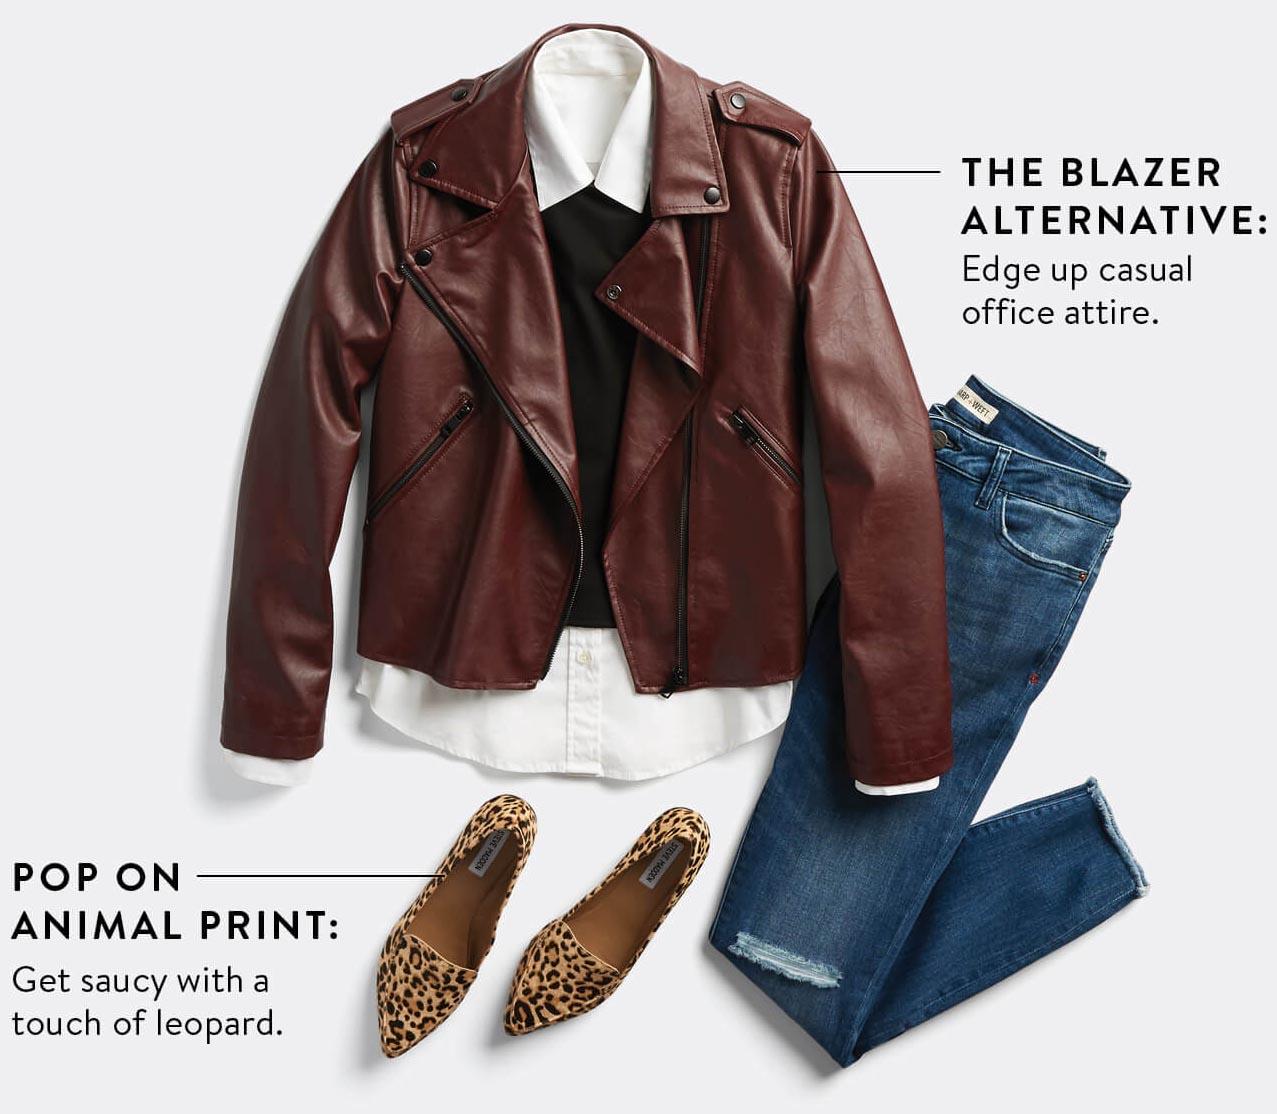 blue-med-skinny-jeans-white-collared-shirt-black-sweater-tan-shoe-pumps-leopard-print-brown-jacket-moto-fall-winter-work.jpg